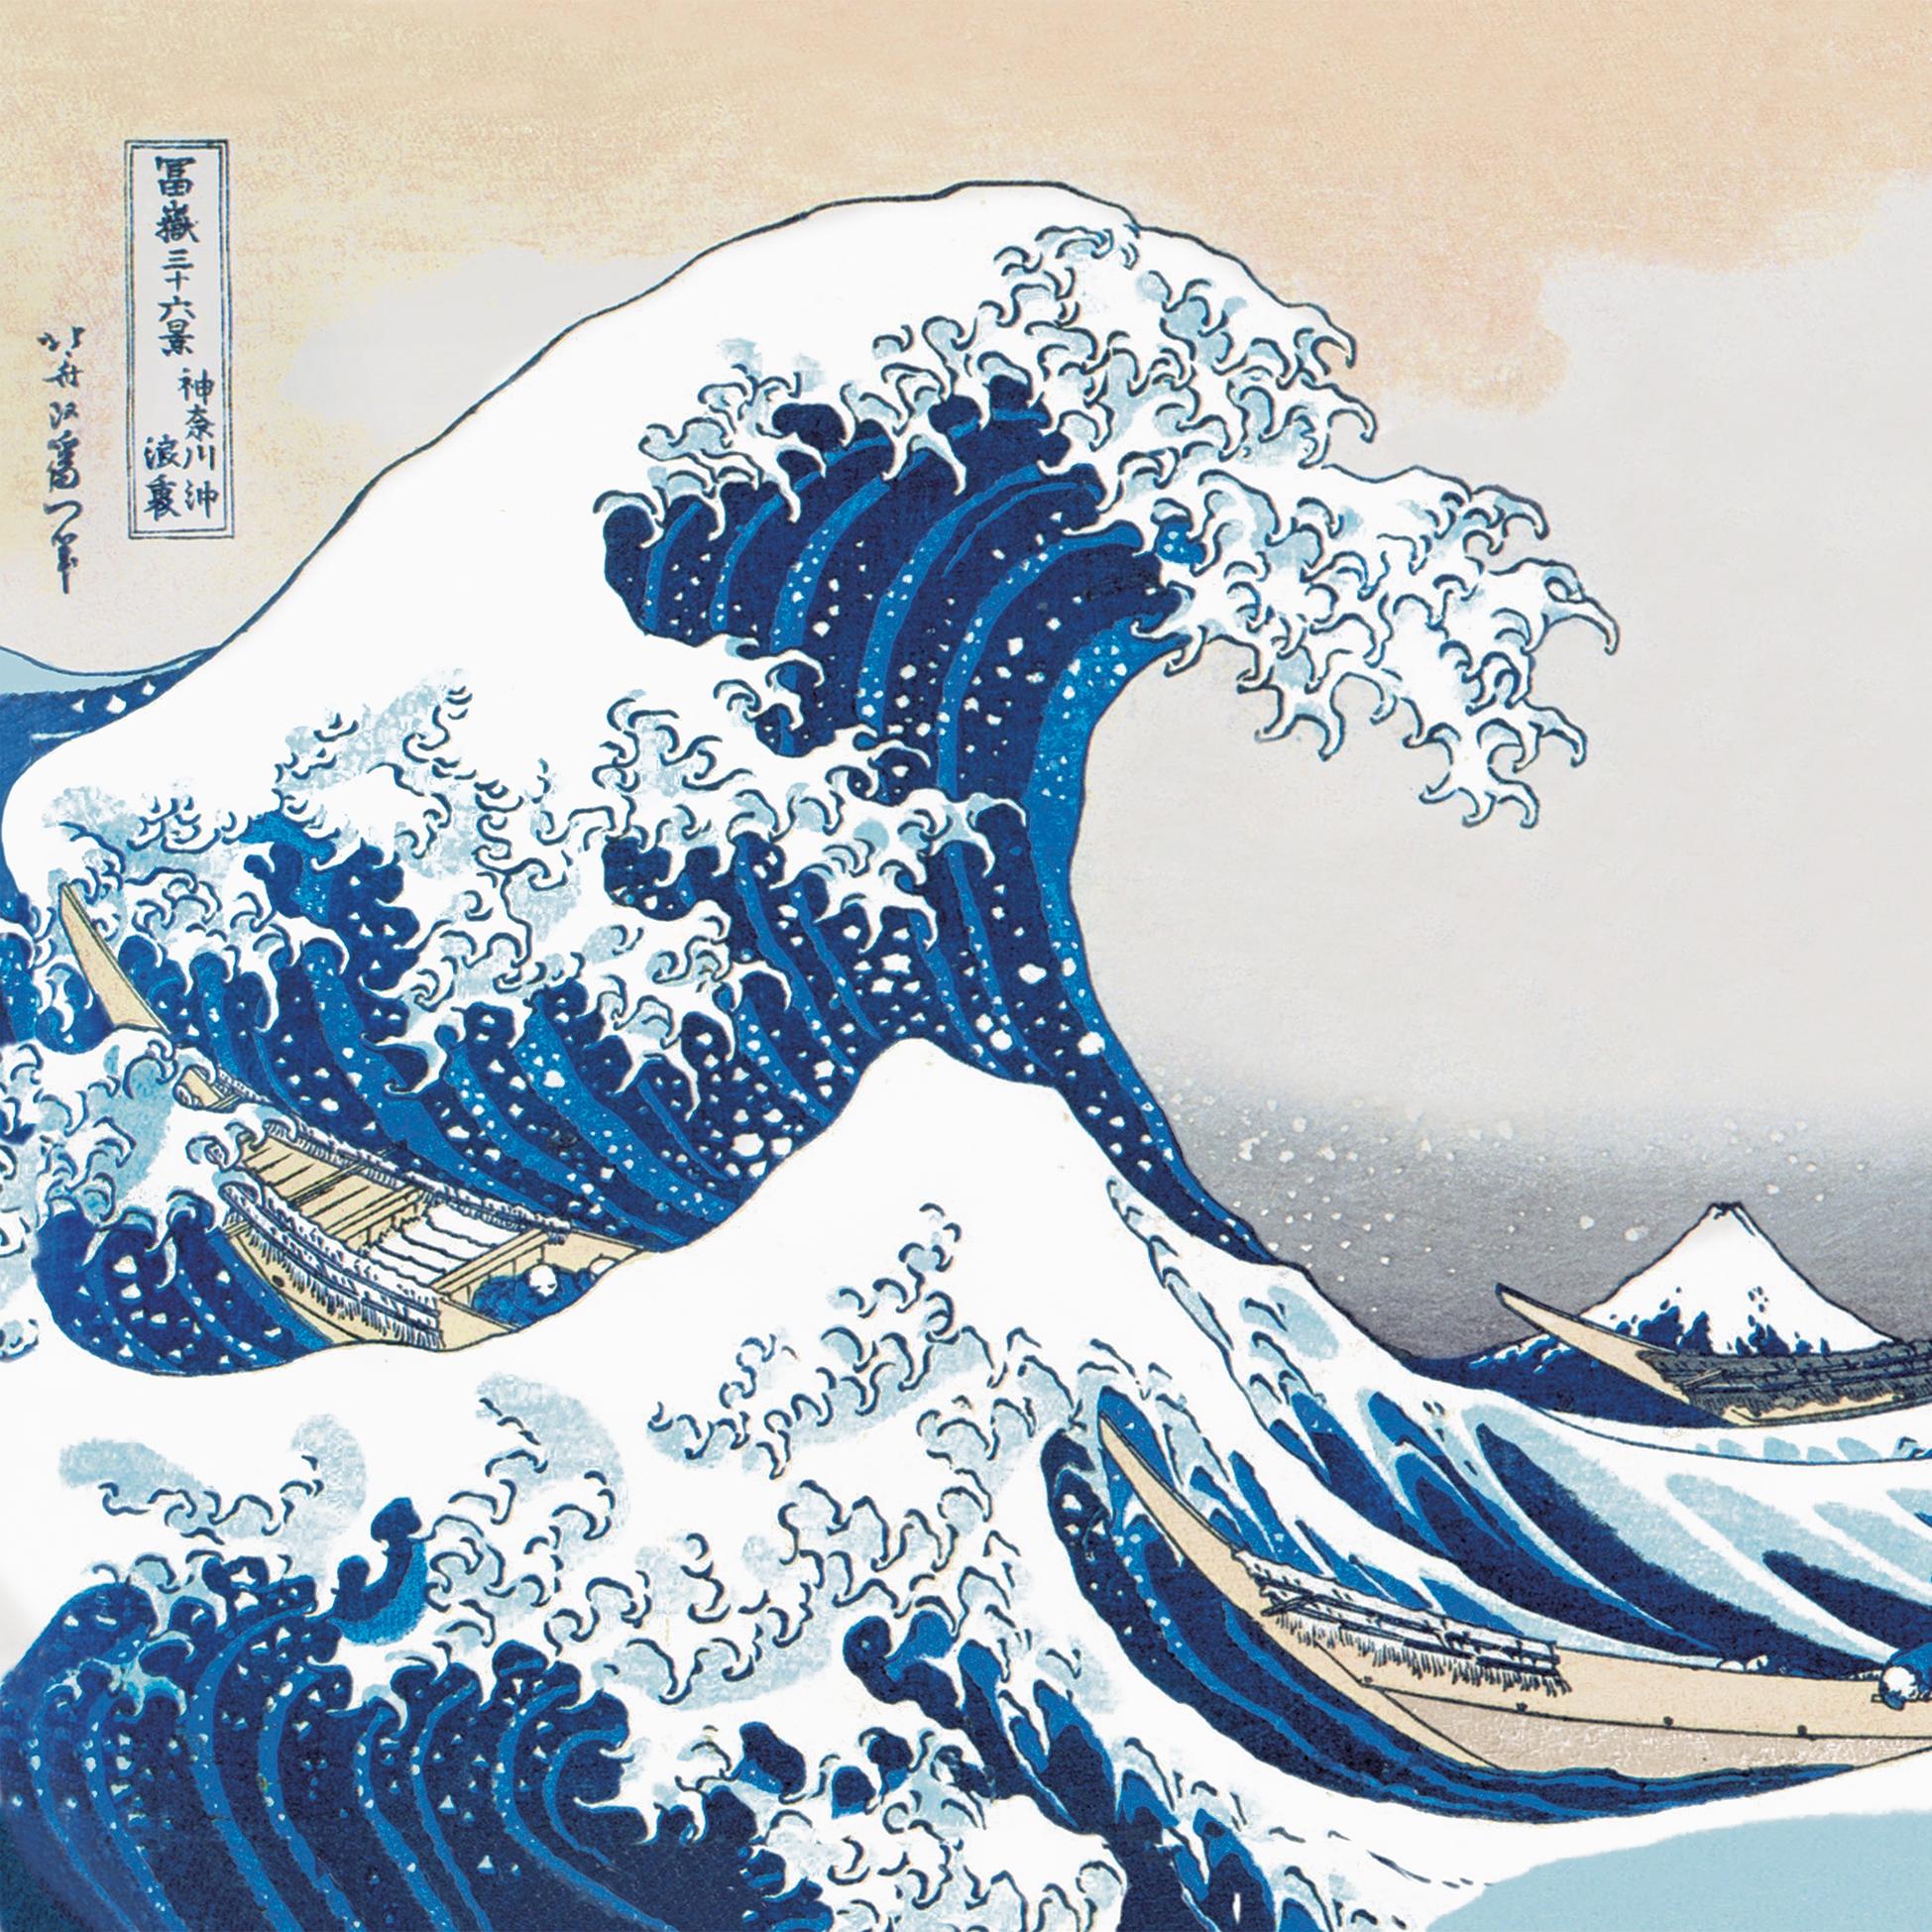 Servilletas 33x33 cm - The Great Wave Napkin 33x33